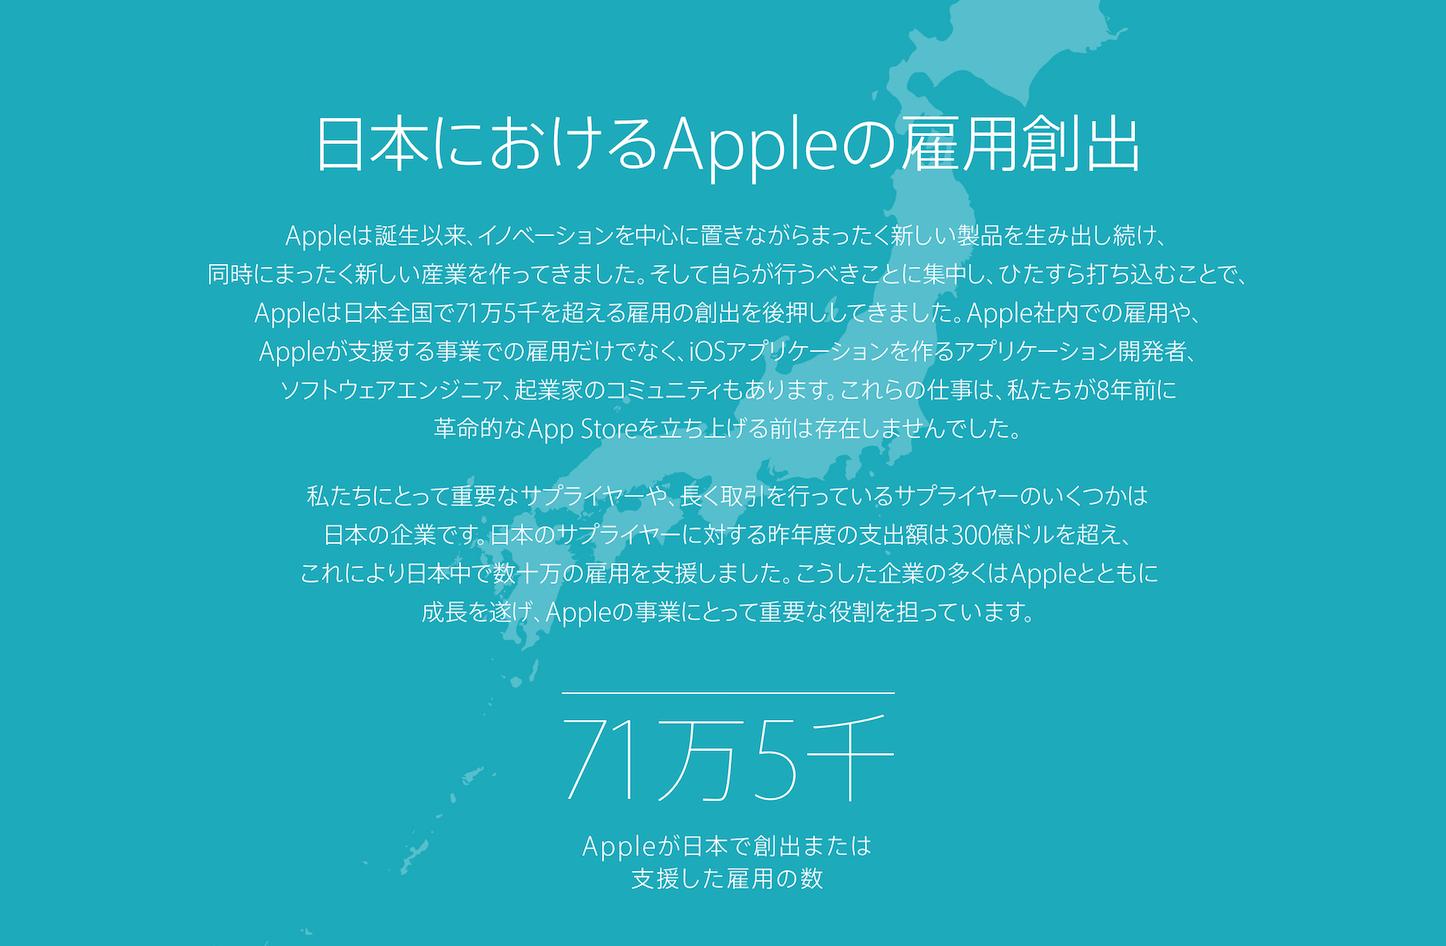 Job creation japan